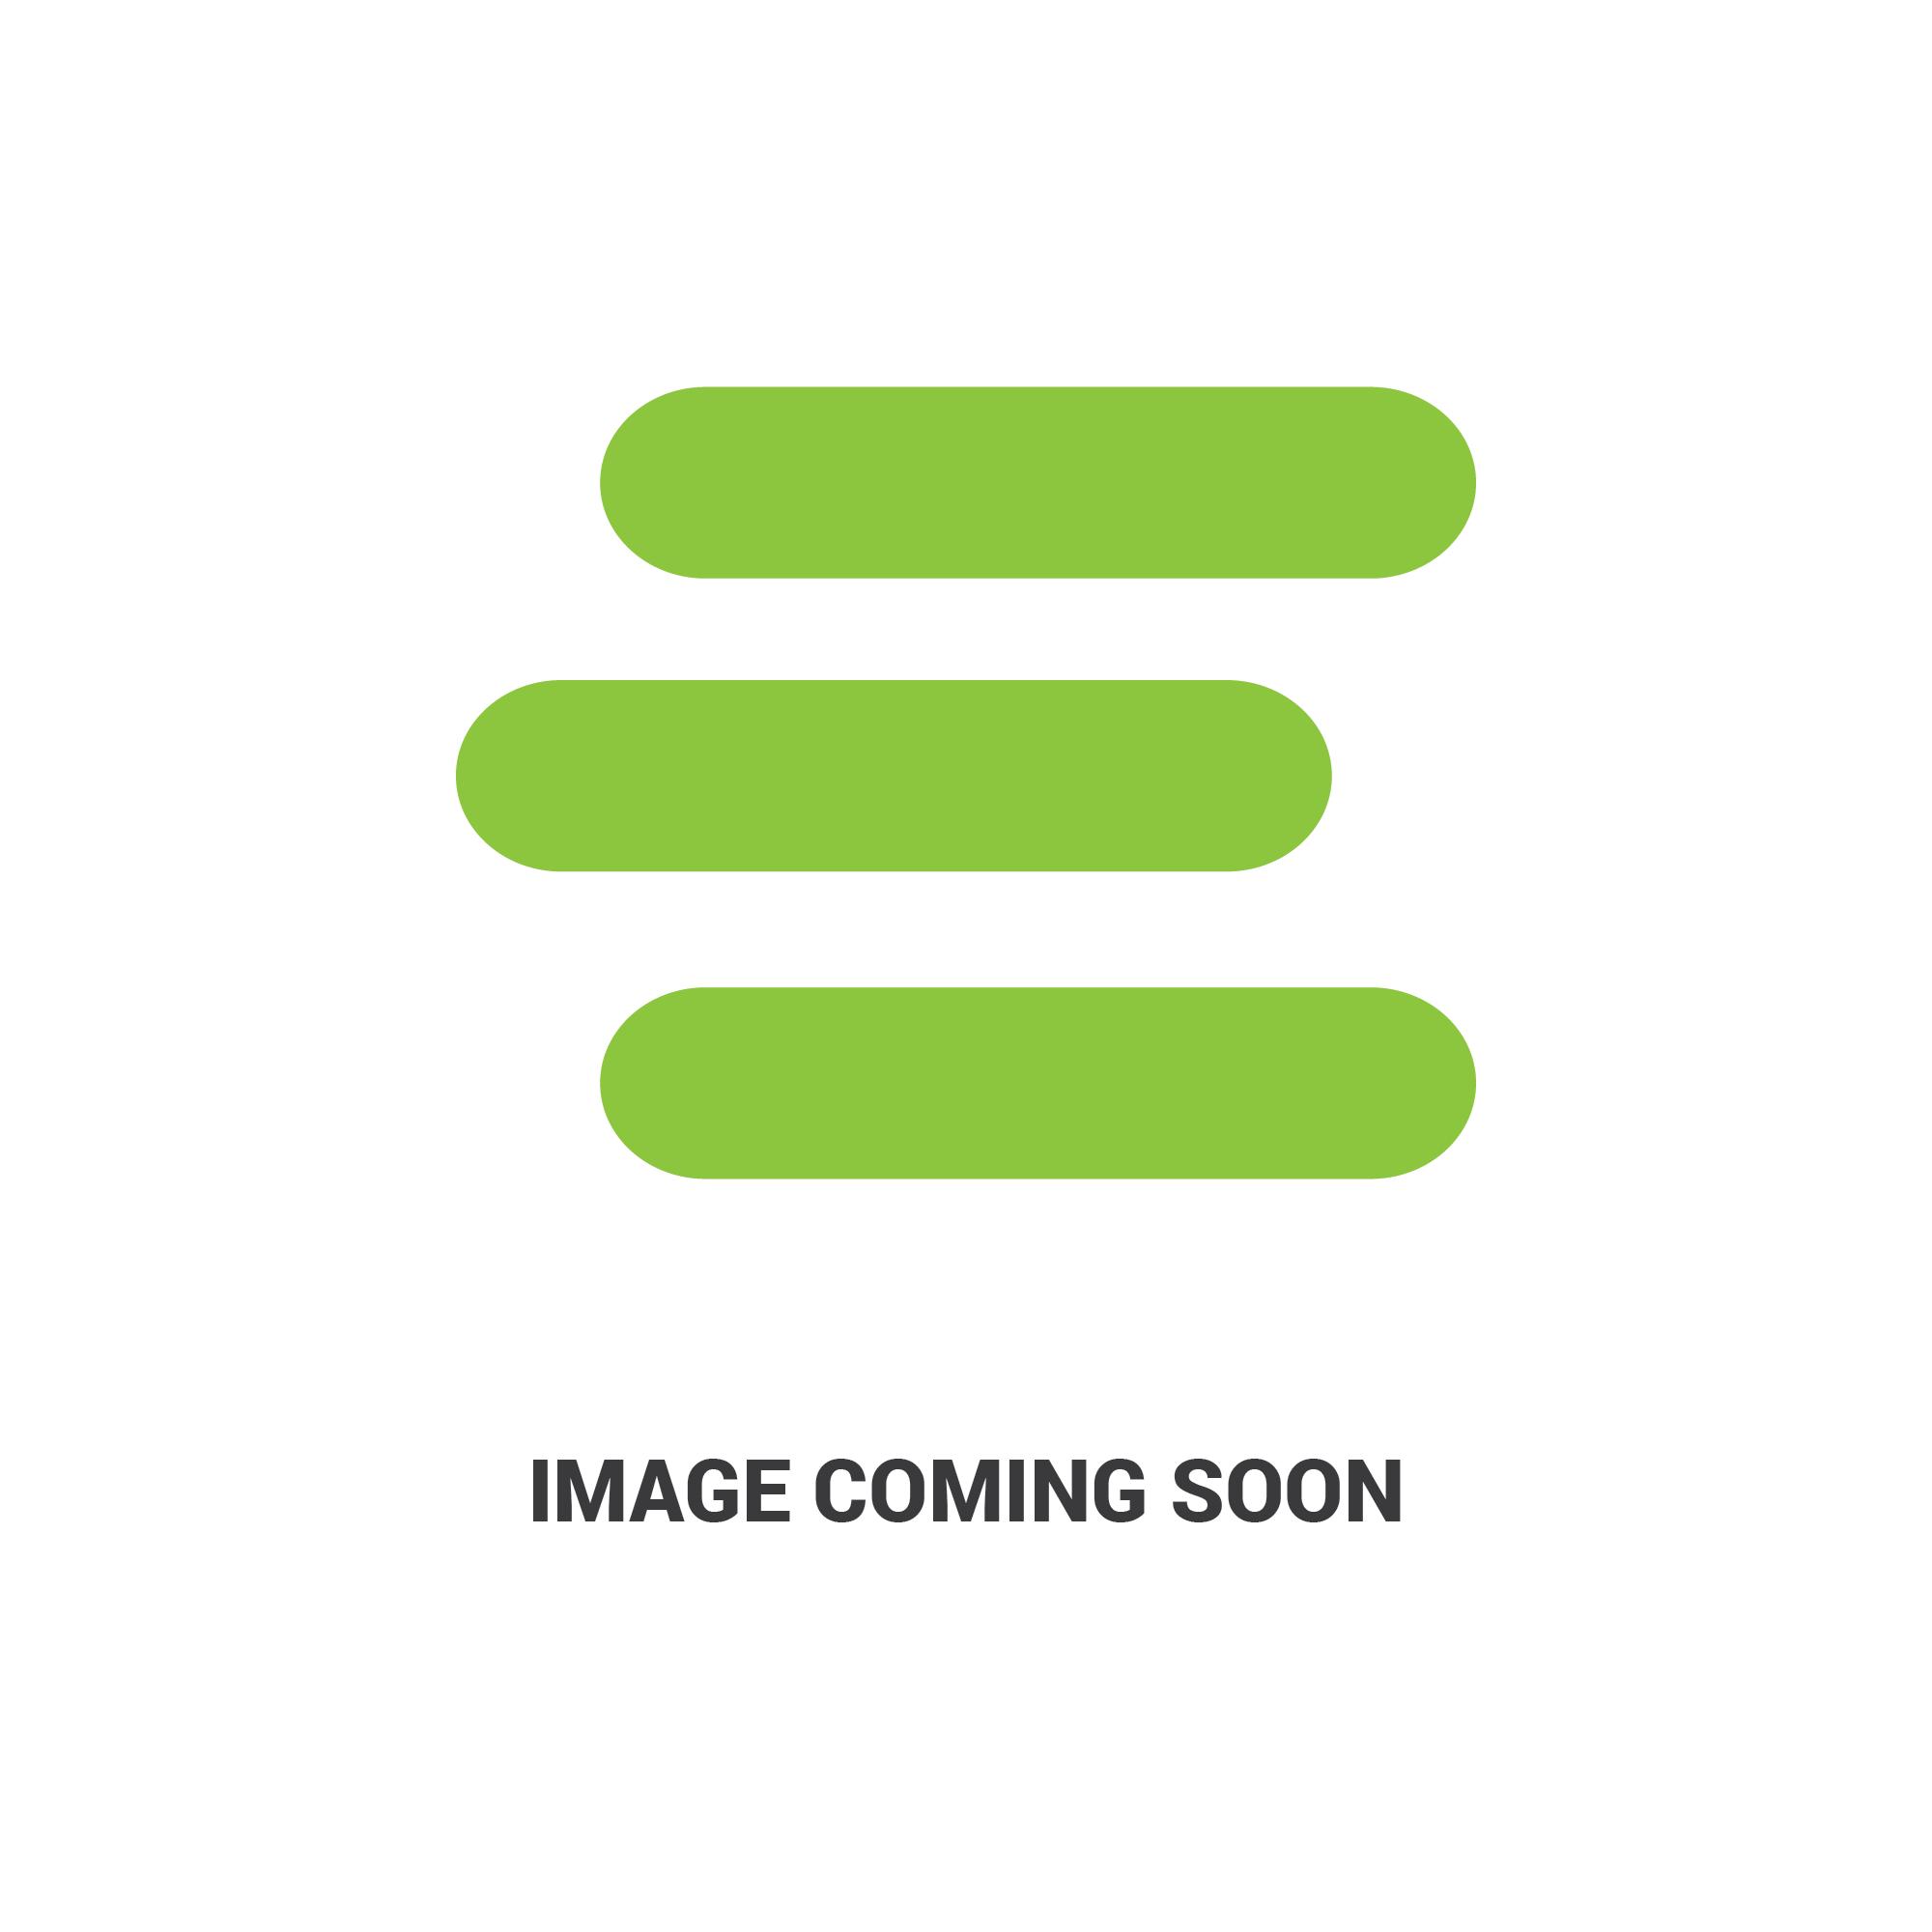 E-PM00310edit 2.jpg